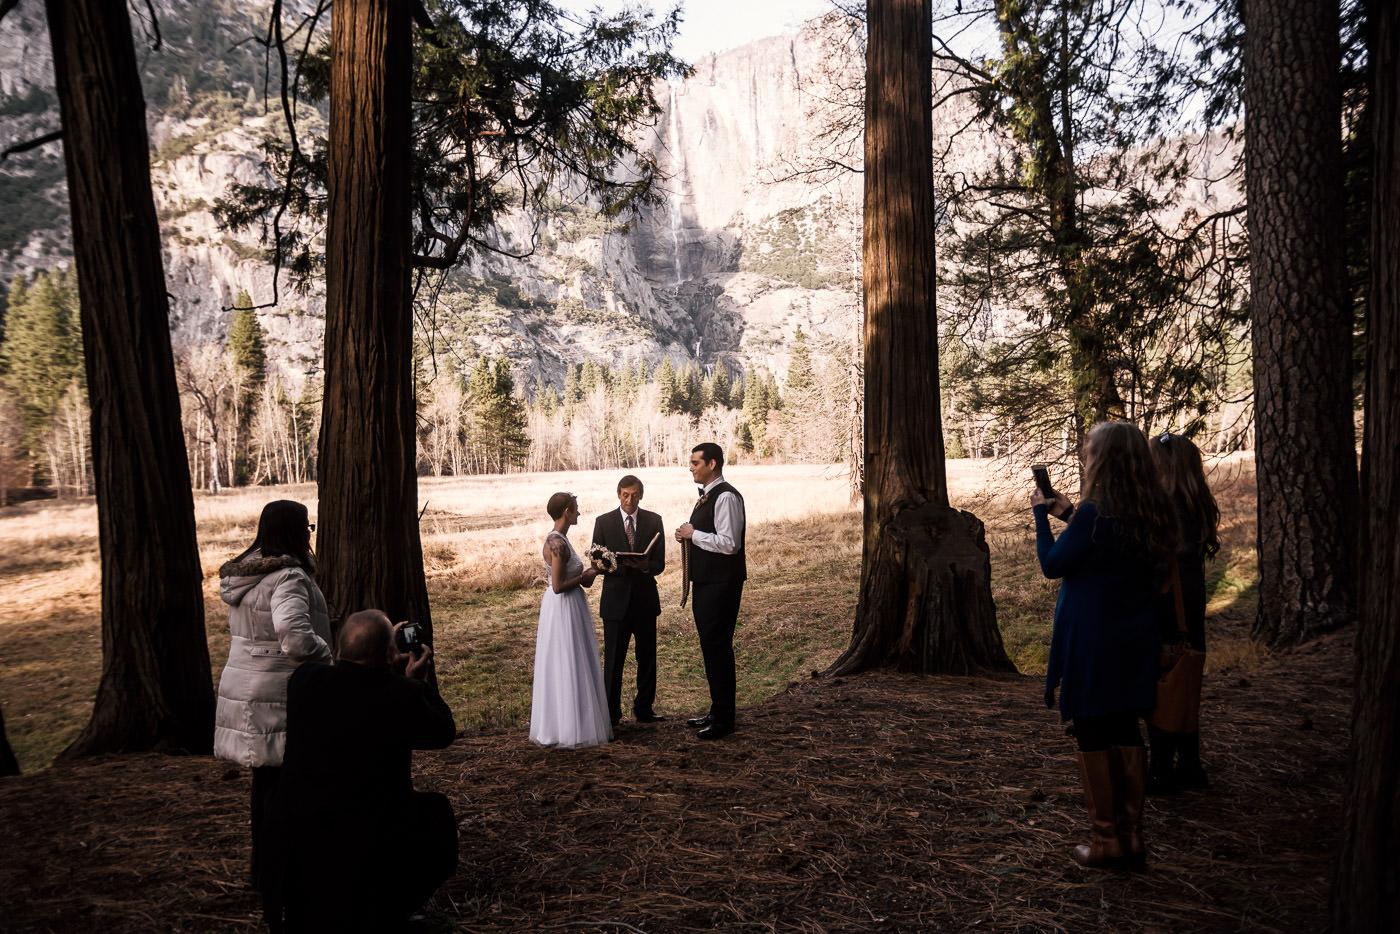 Intimate elopement ceremony between two beautiful pines at Swinging Bridge in Yosemite National Park.